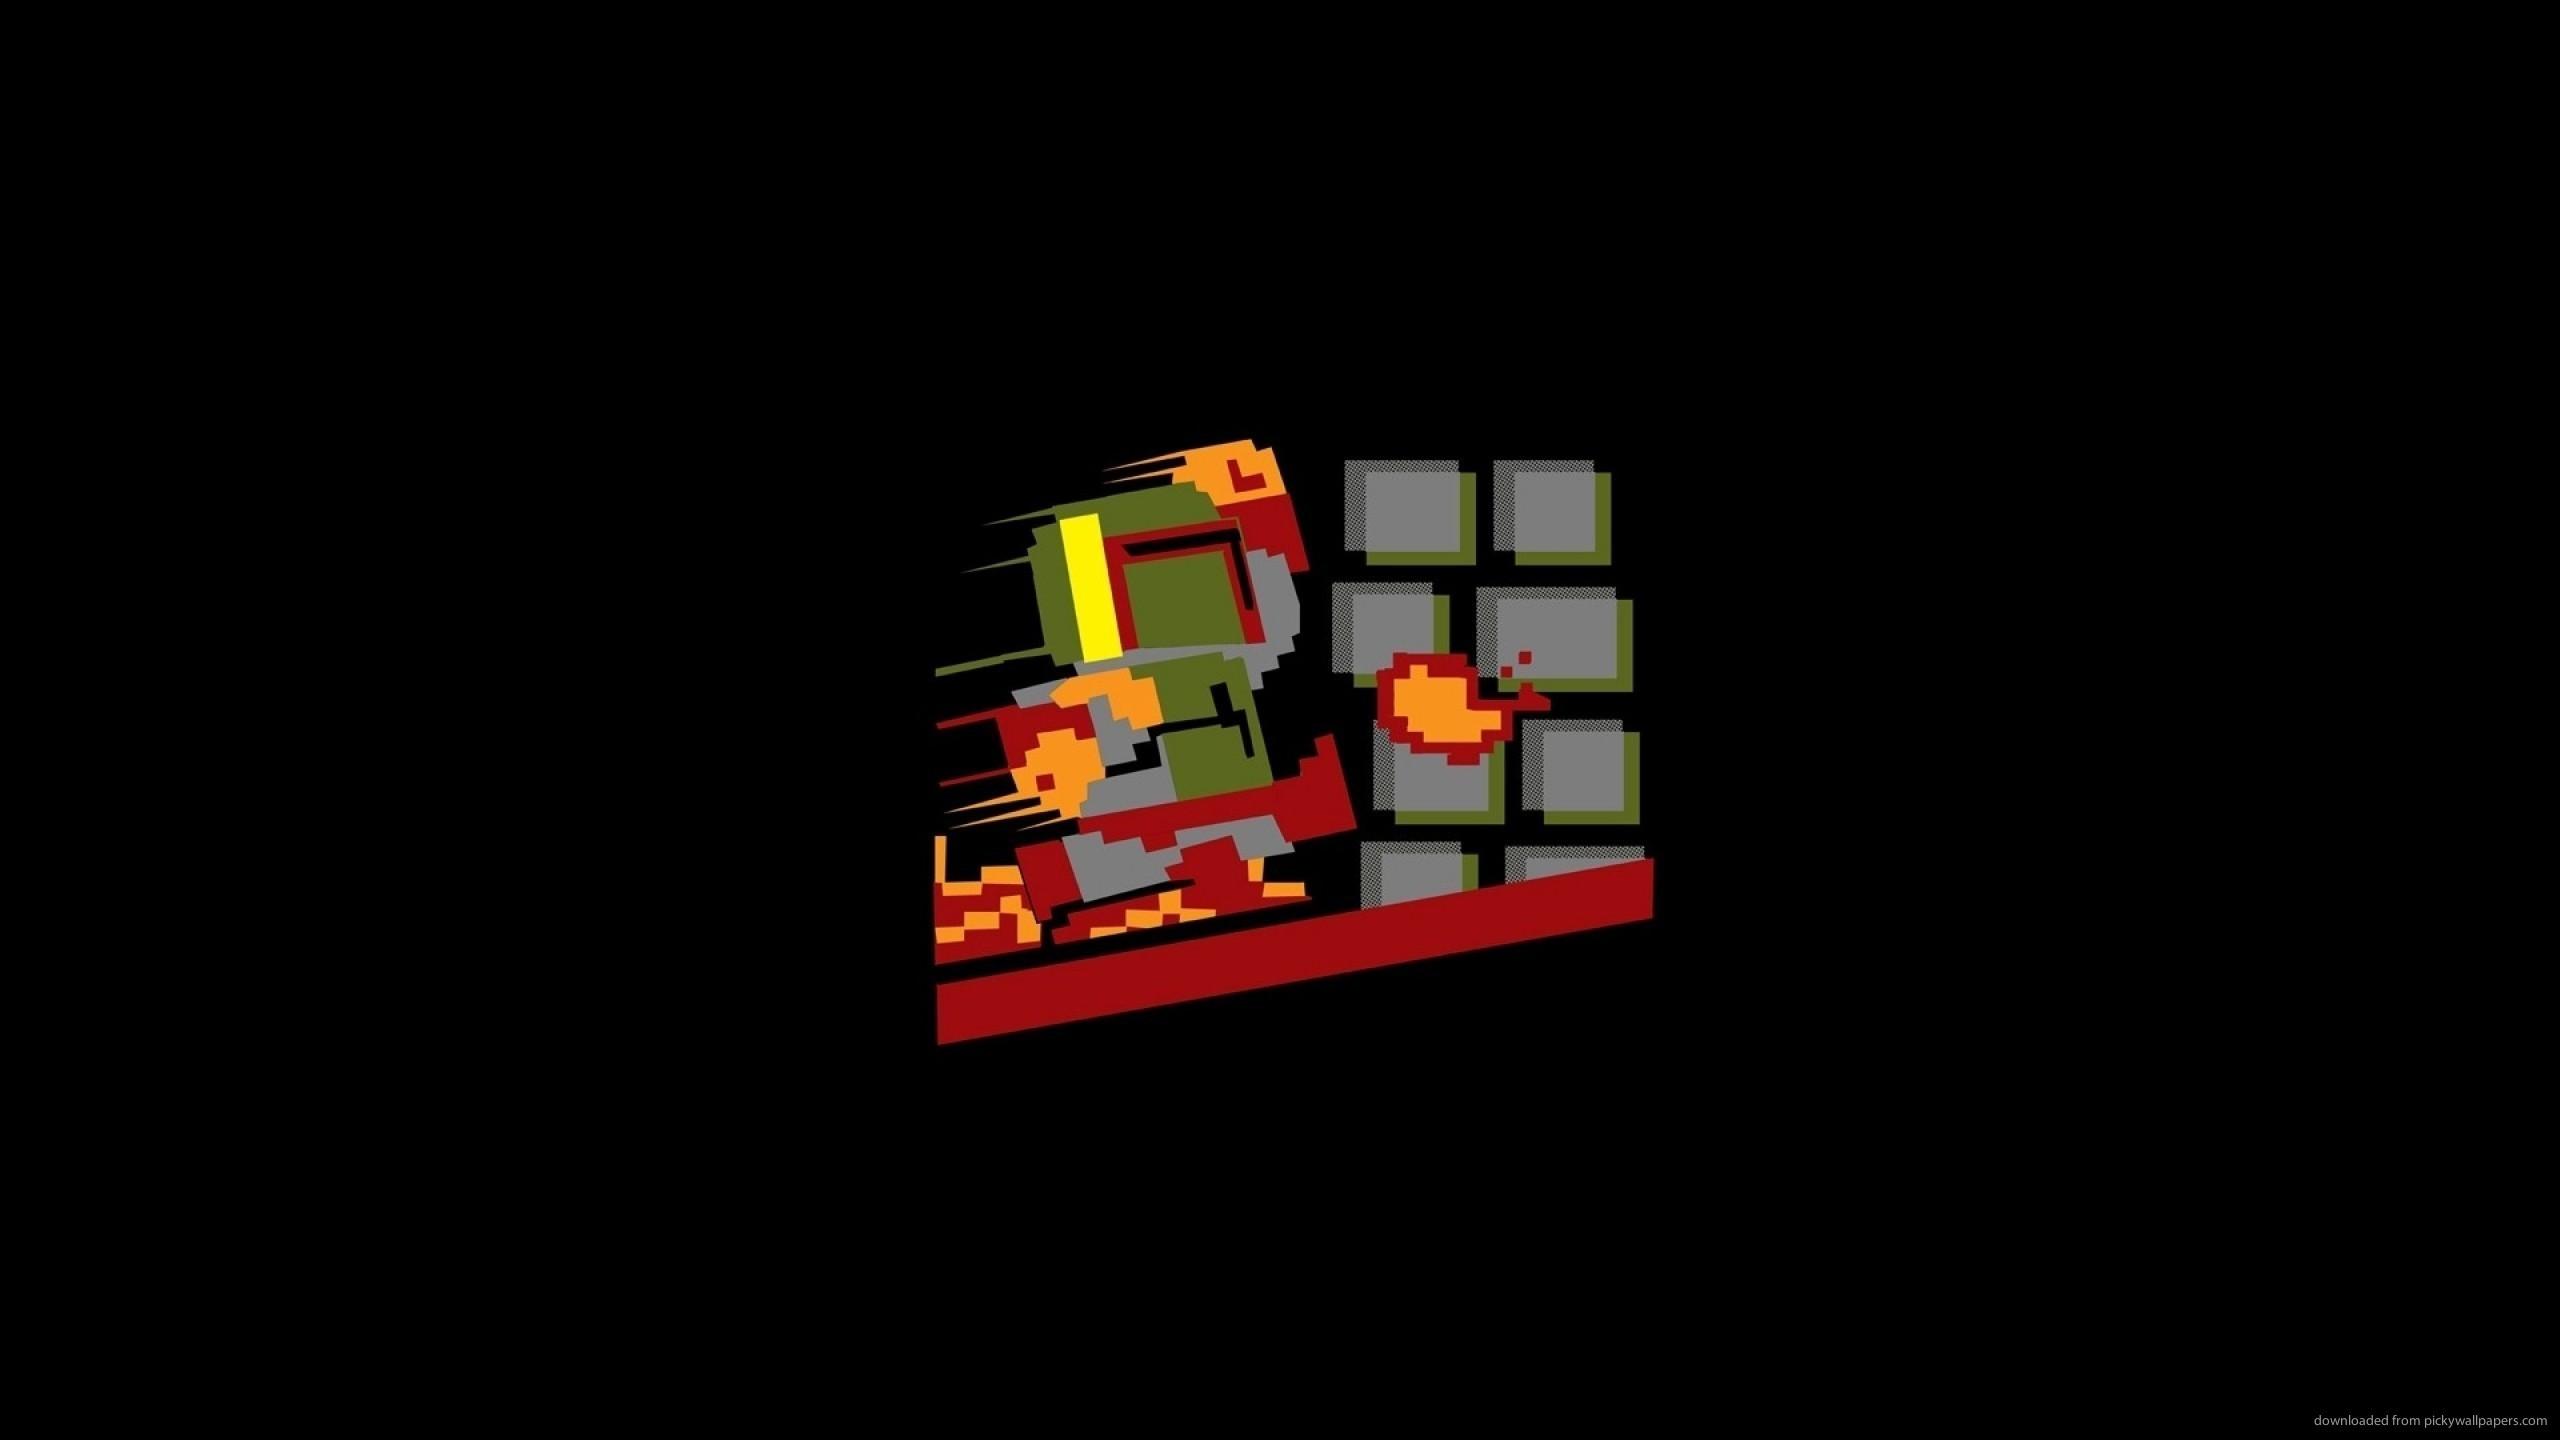 Boba Fett Mario Style for 2560×1440